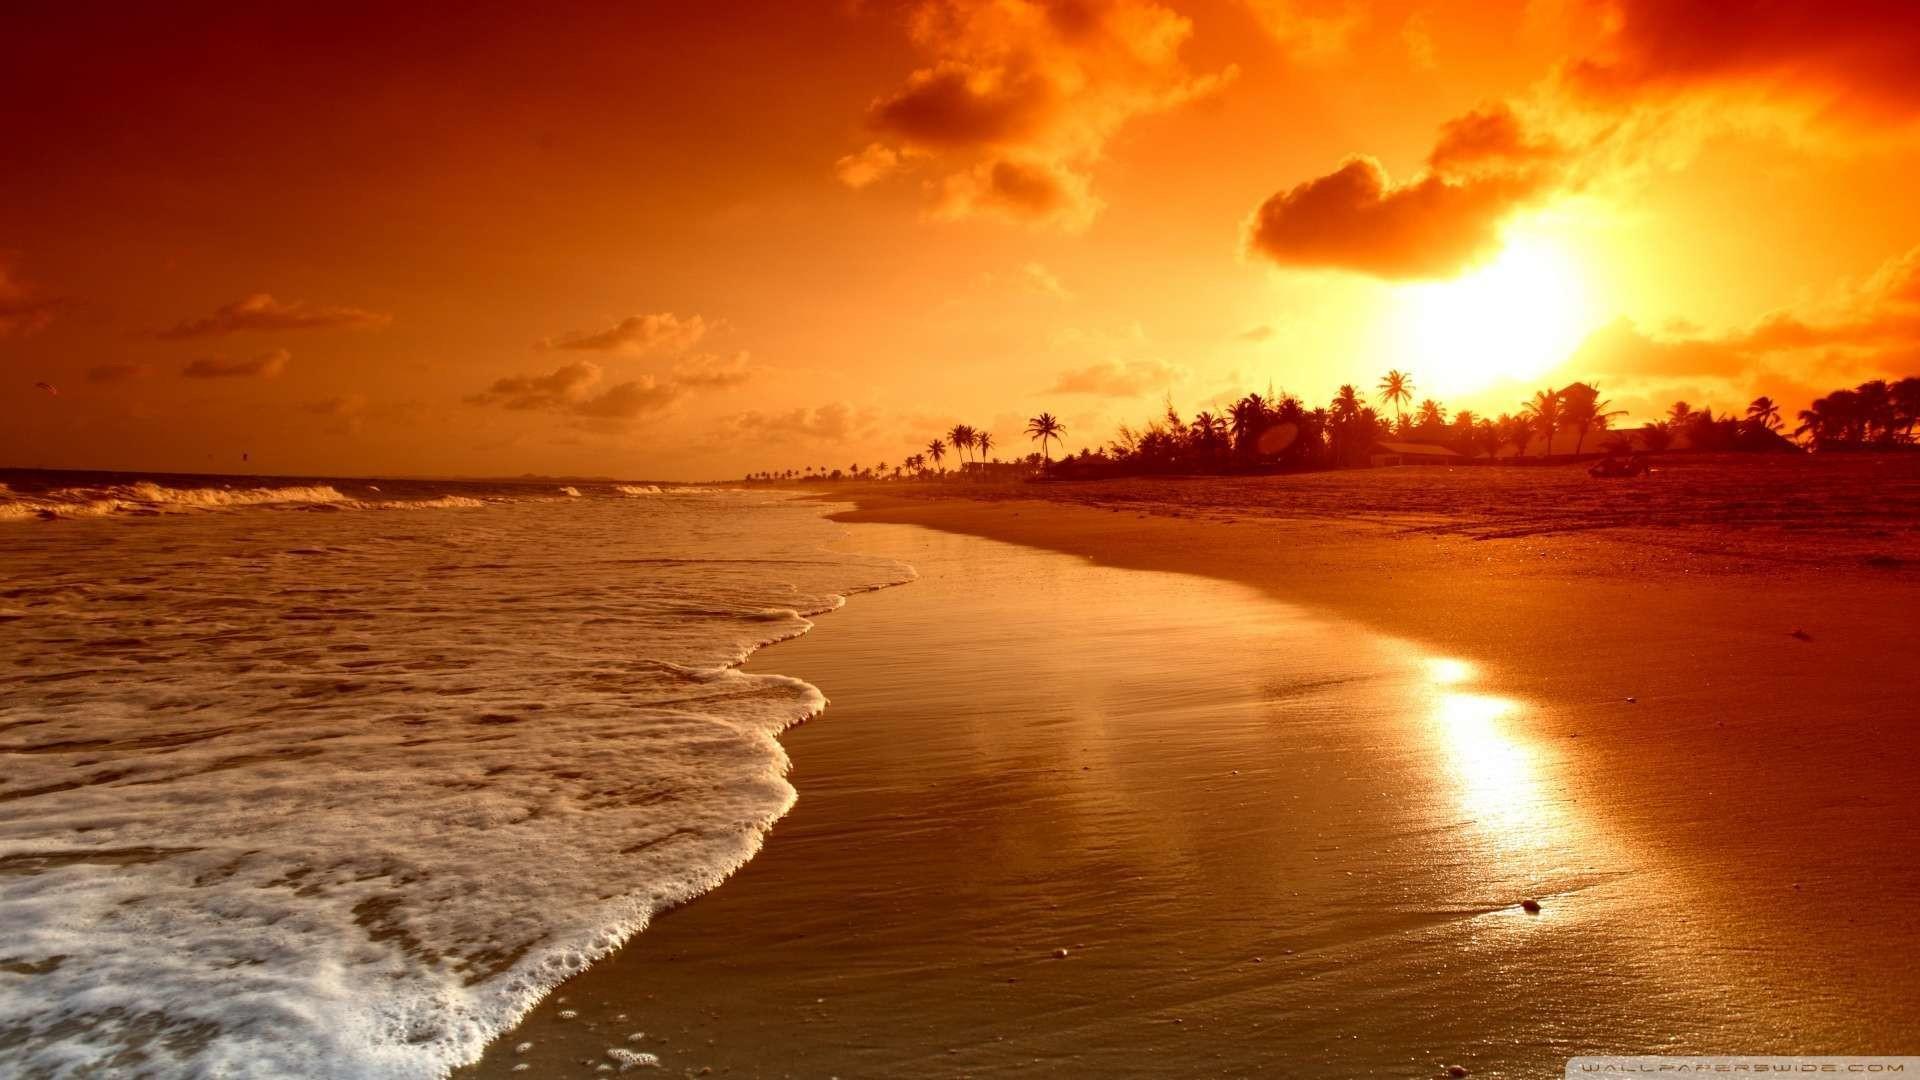 Wallpaper: Beach Sunrise Wallpaper 1080p HD. Upload at February 2 .